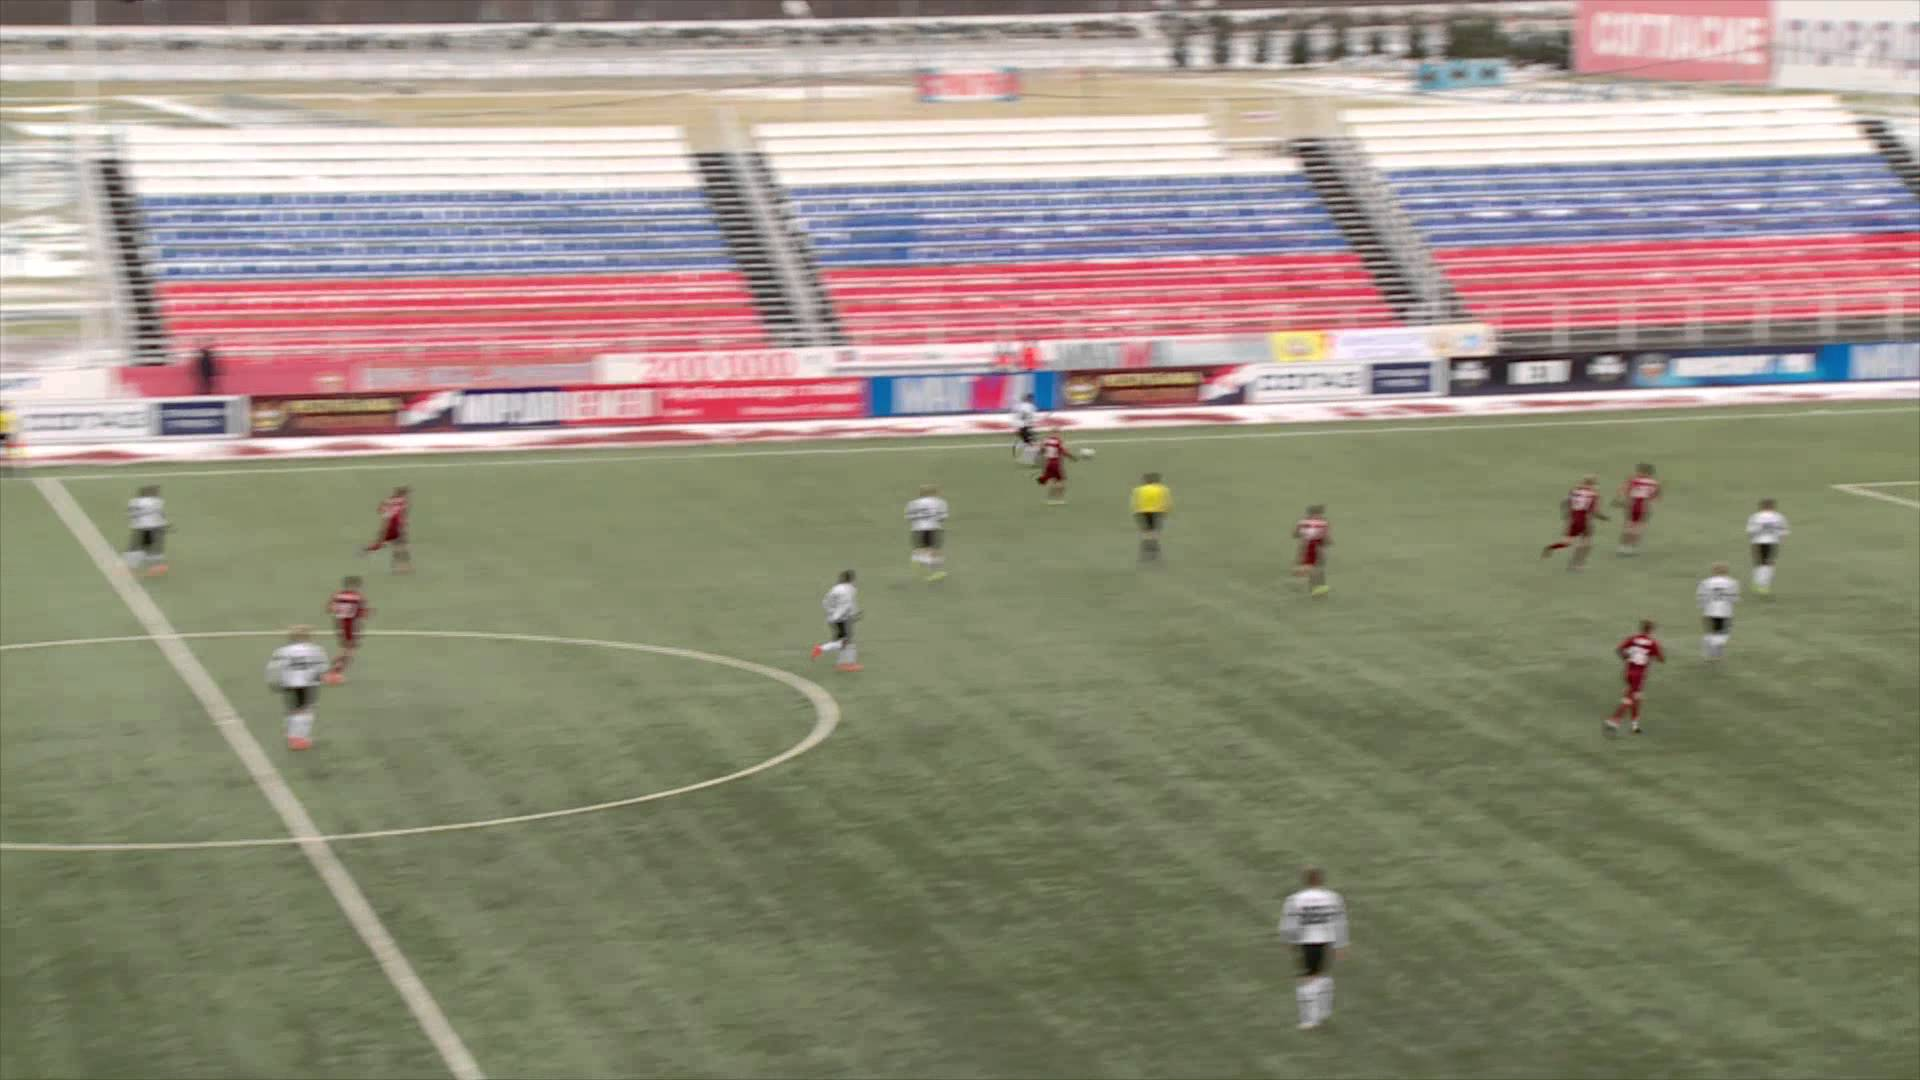 Видеообзор матча 12-го тура Молодежного Первенства «Мордовия-мол.» (Саранск) – «Краснодар-мол.»